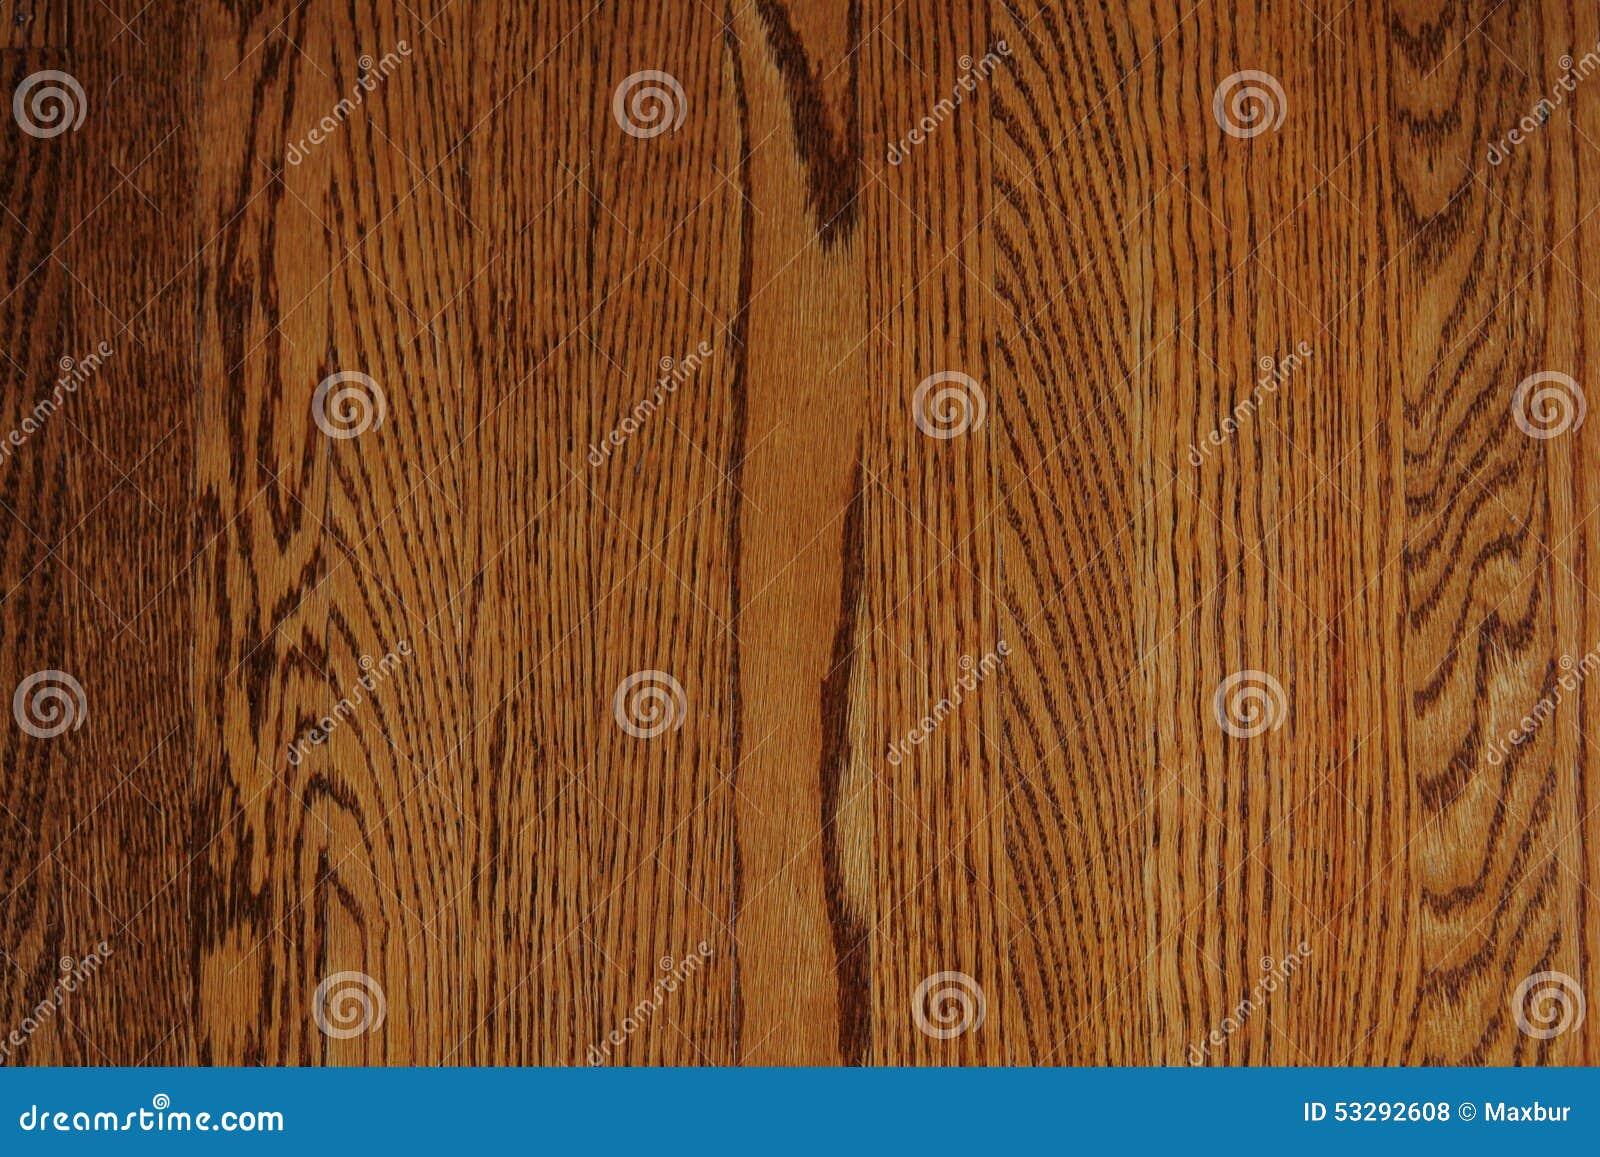 Refurbished oak hardwood floor stock photo image 53292608 for Hardwood floors quad cities